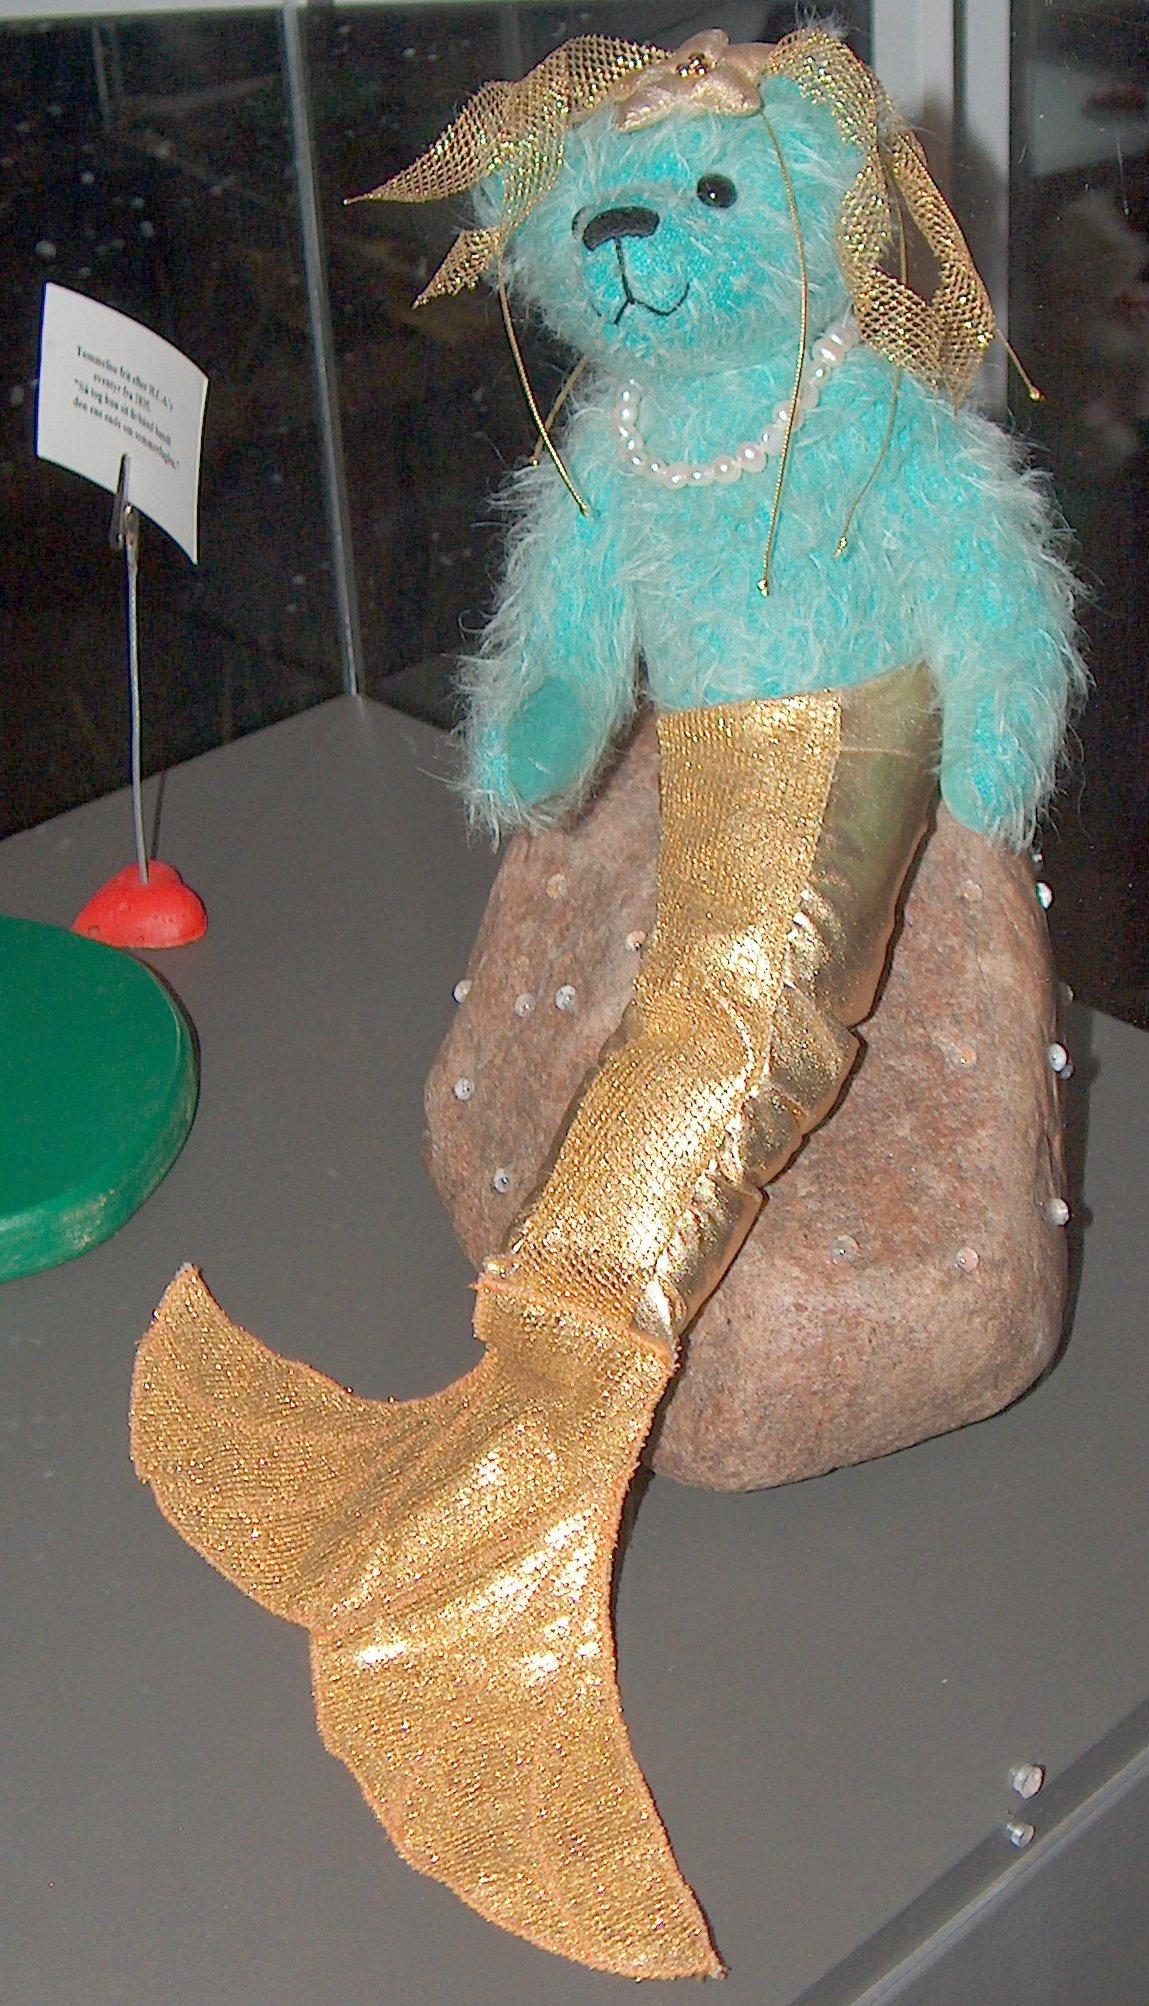 den-lille-havfrue